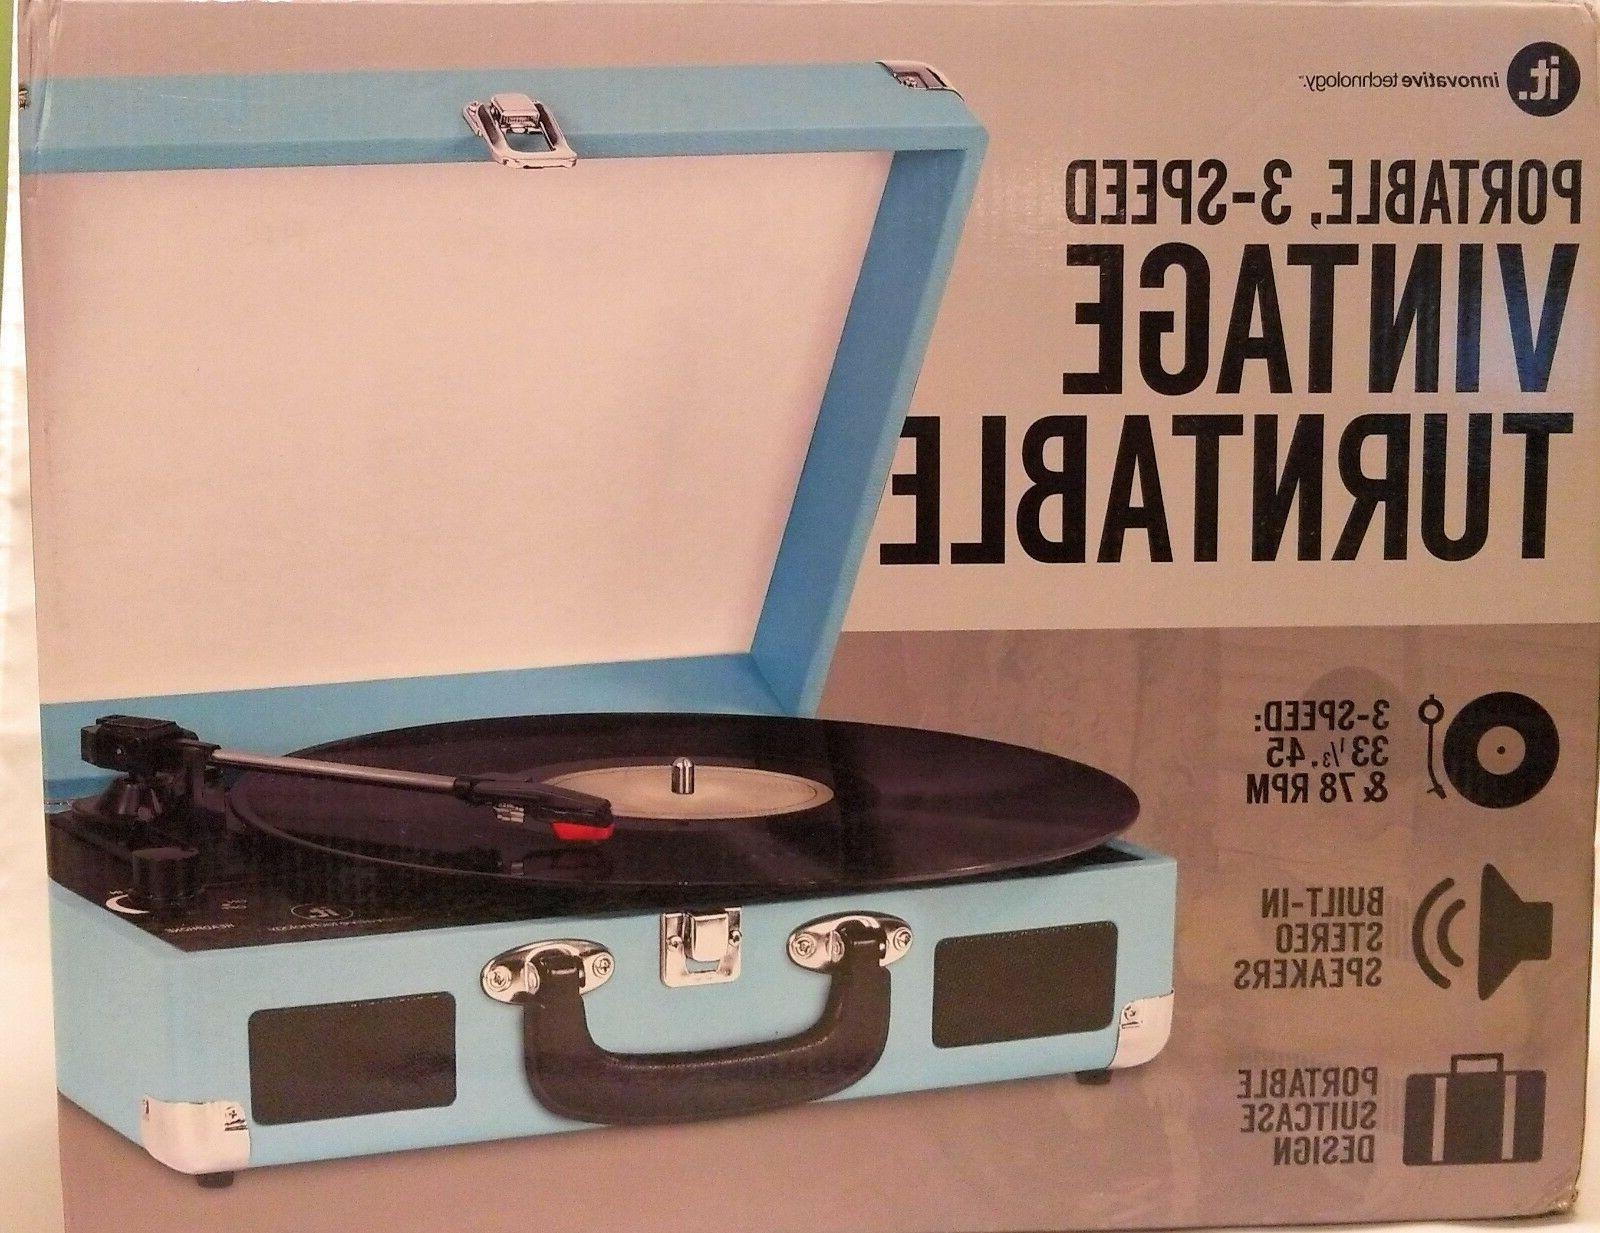 nostalgic vintage suitcase turntable